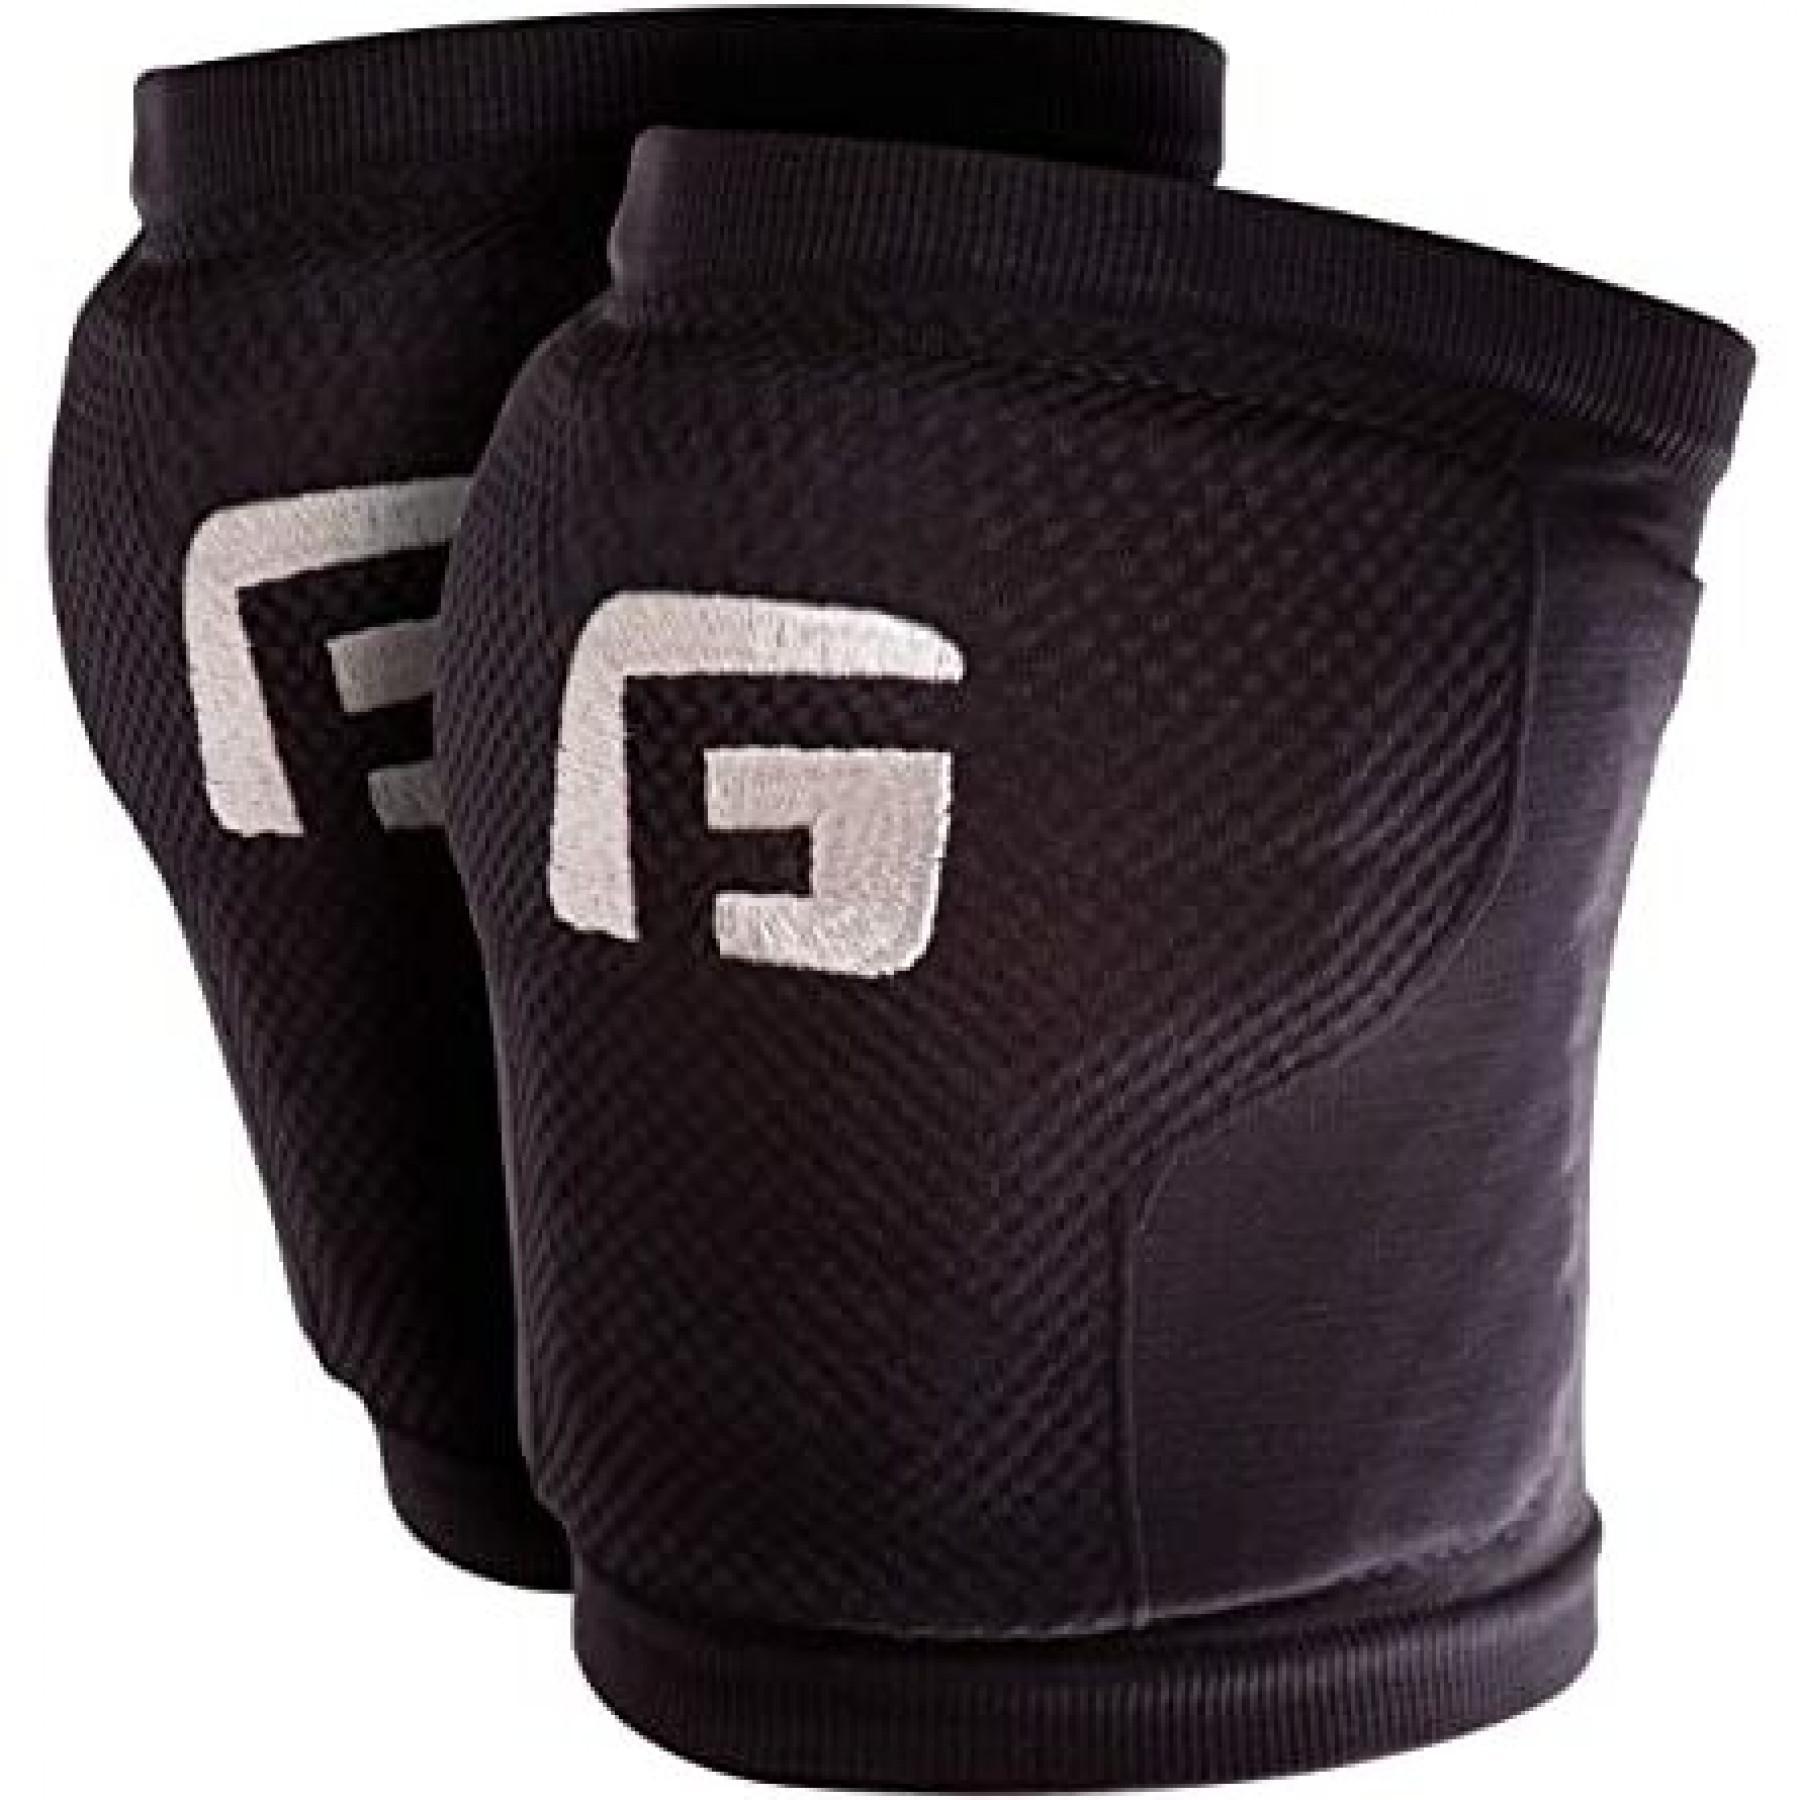 Knee braceG-Form Envy Pads